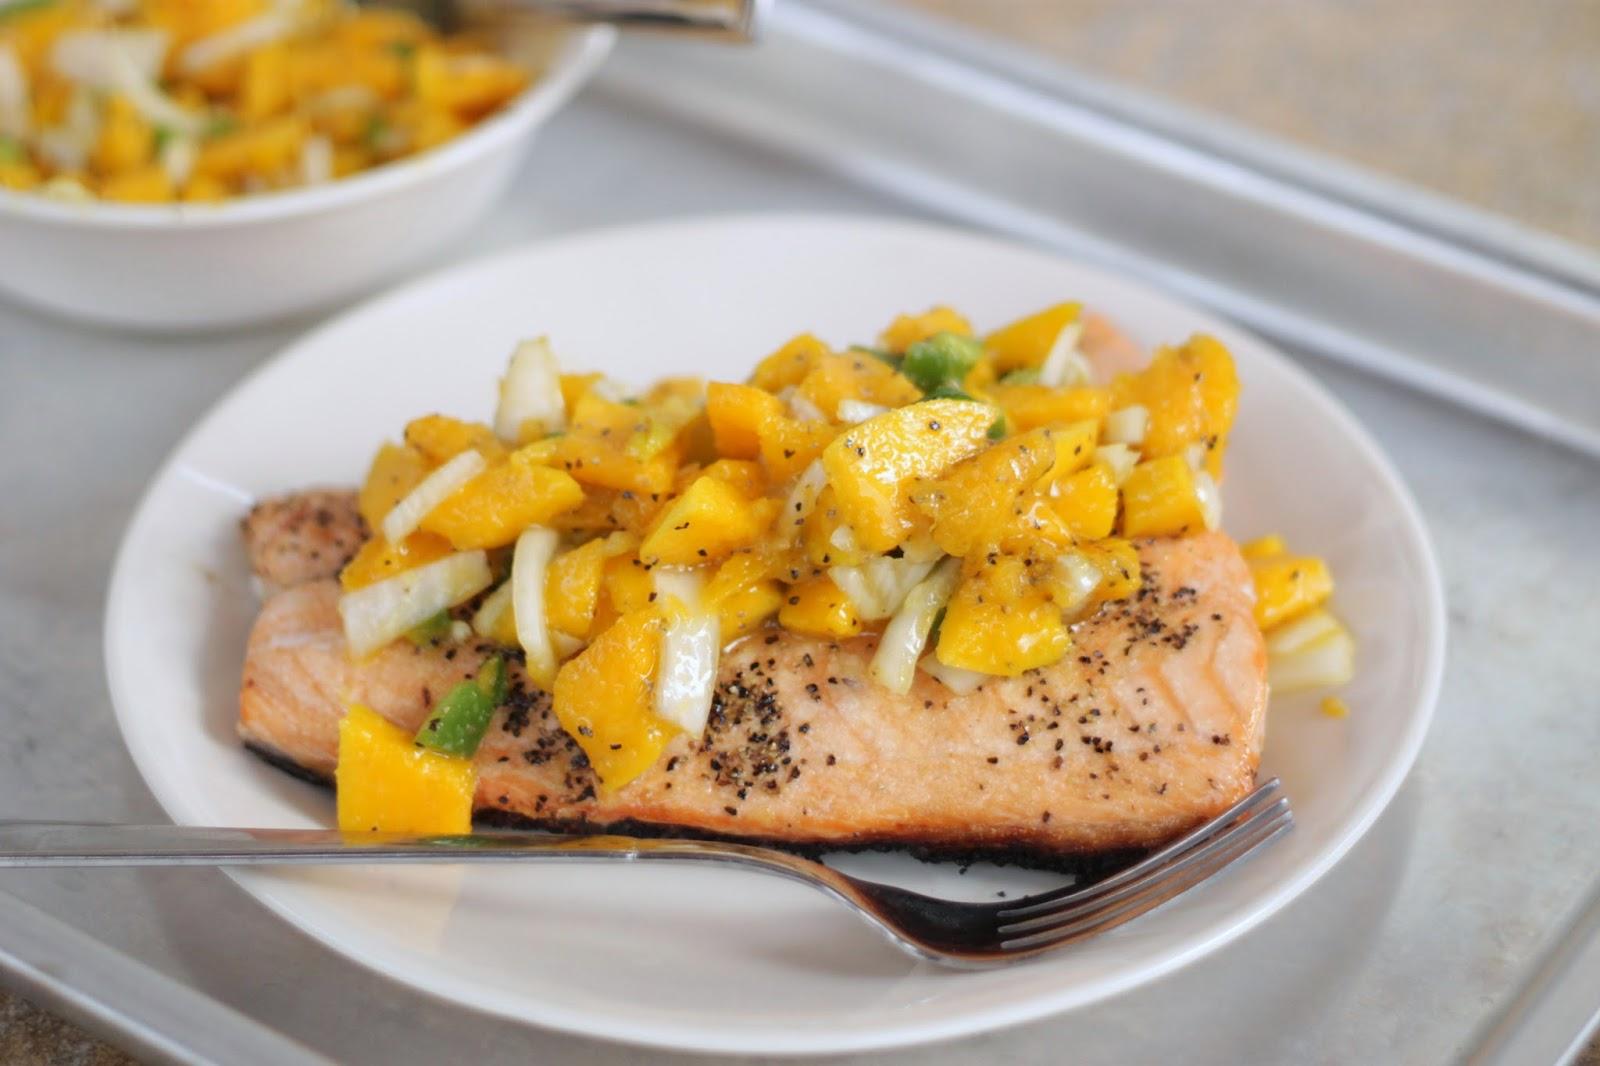 Brunch N' Cupcakes: {Grilled Salmon with Orange Mango Salsa}